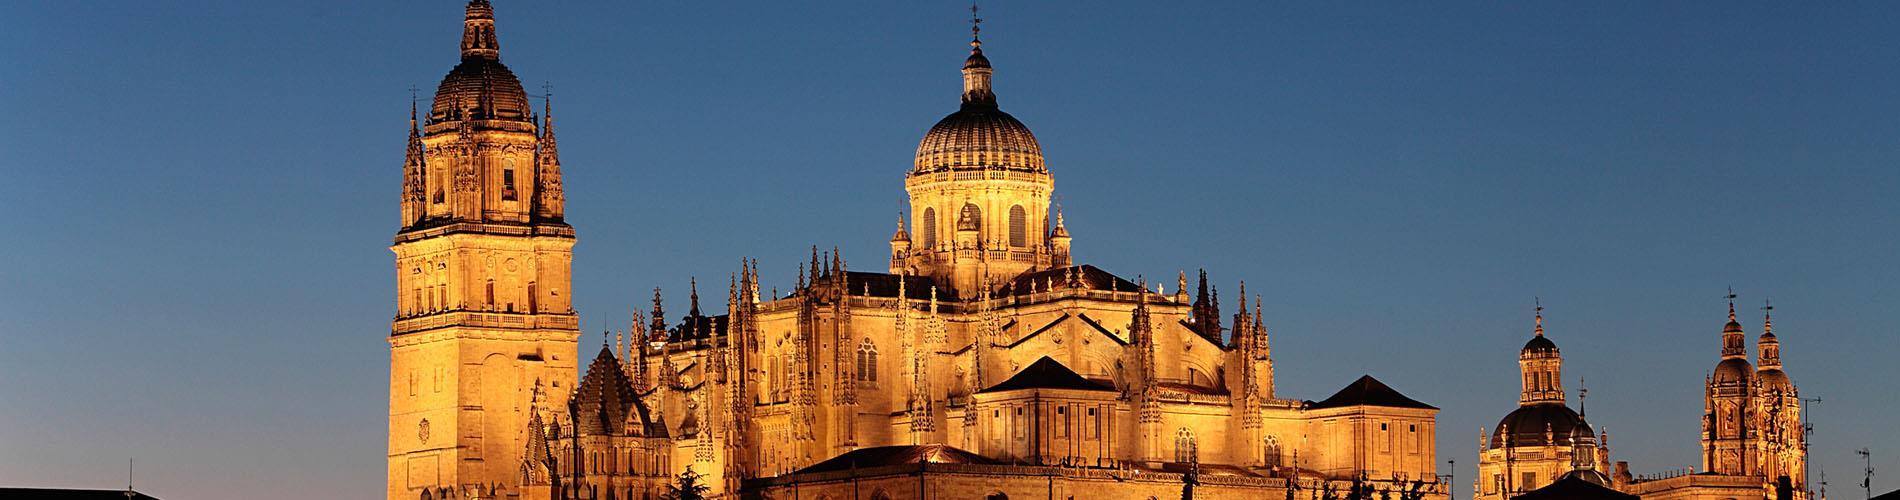 Salamanca-by-Night-Free-Tour-2